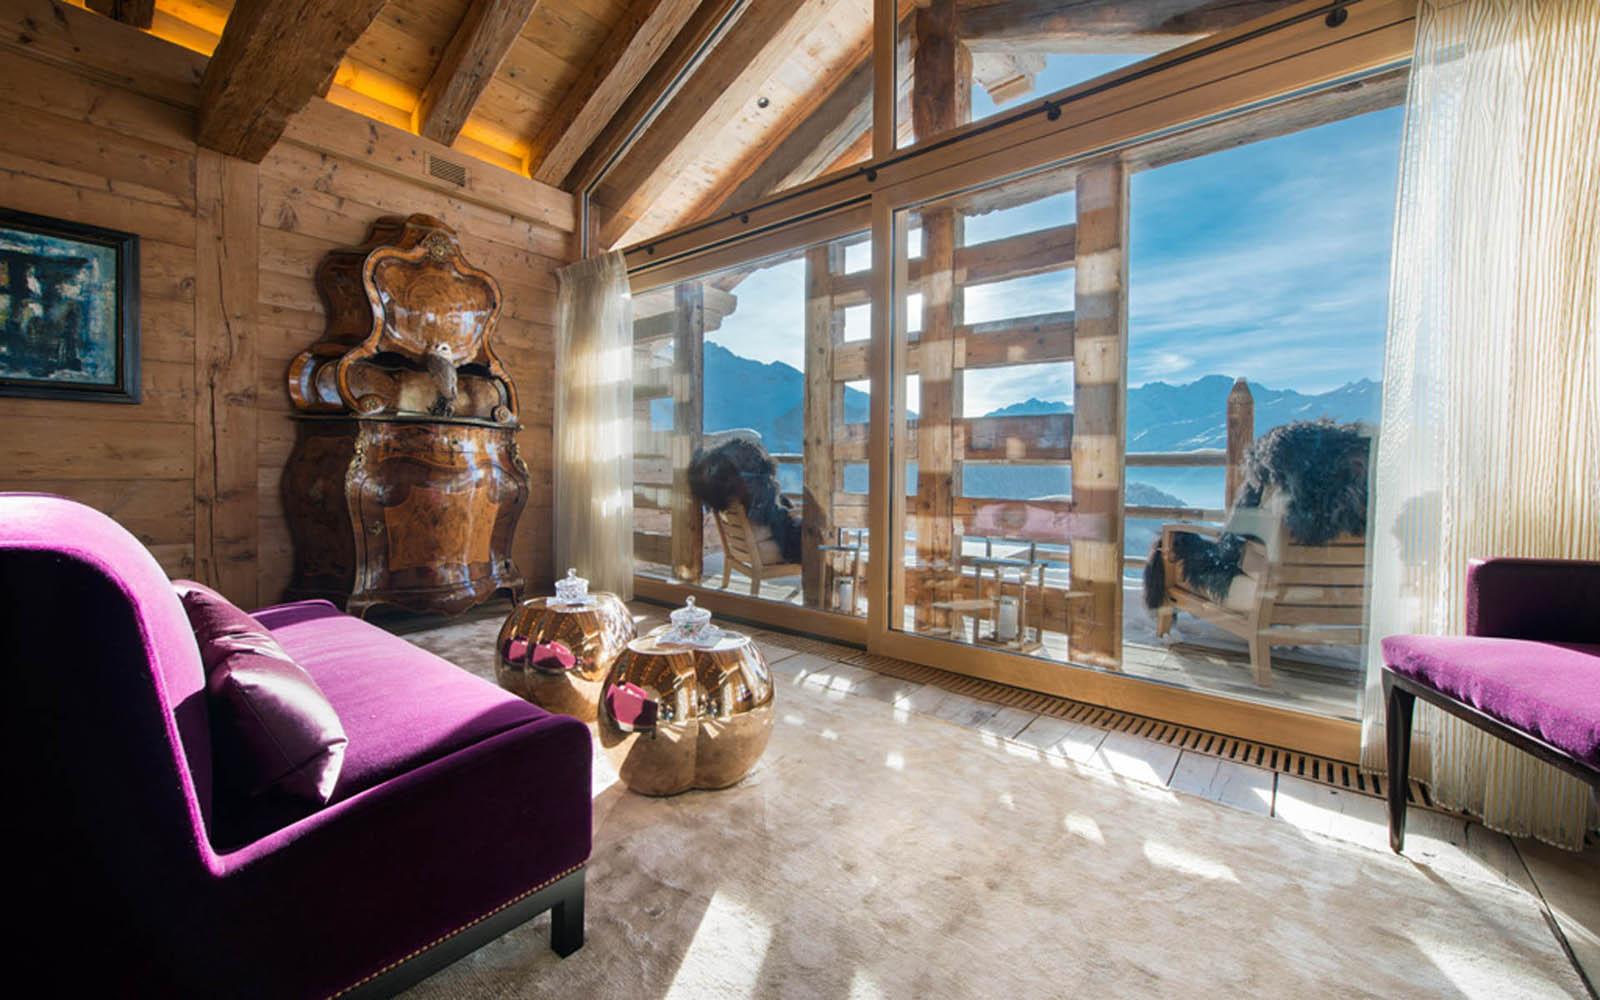 Les Trois Couronnes Eco Friendly Chalet In Verbier IDesignArch Interior Design